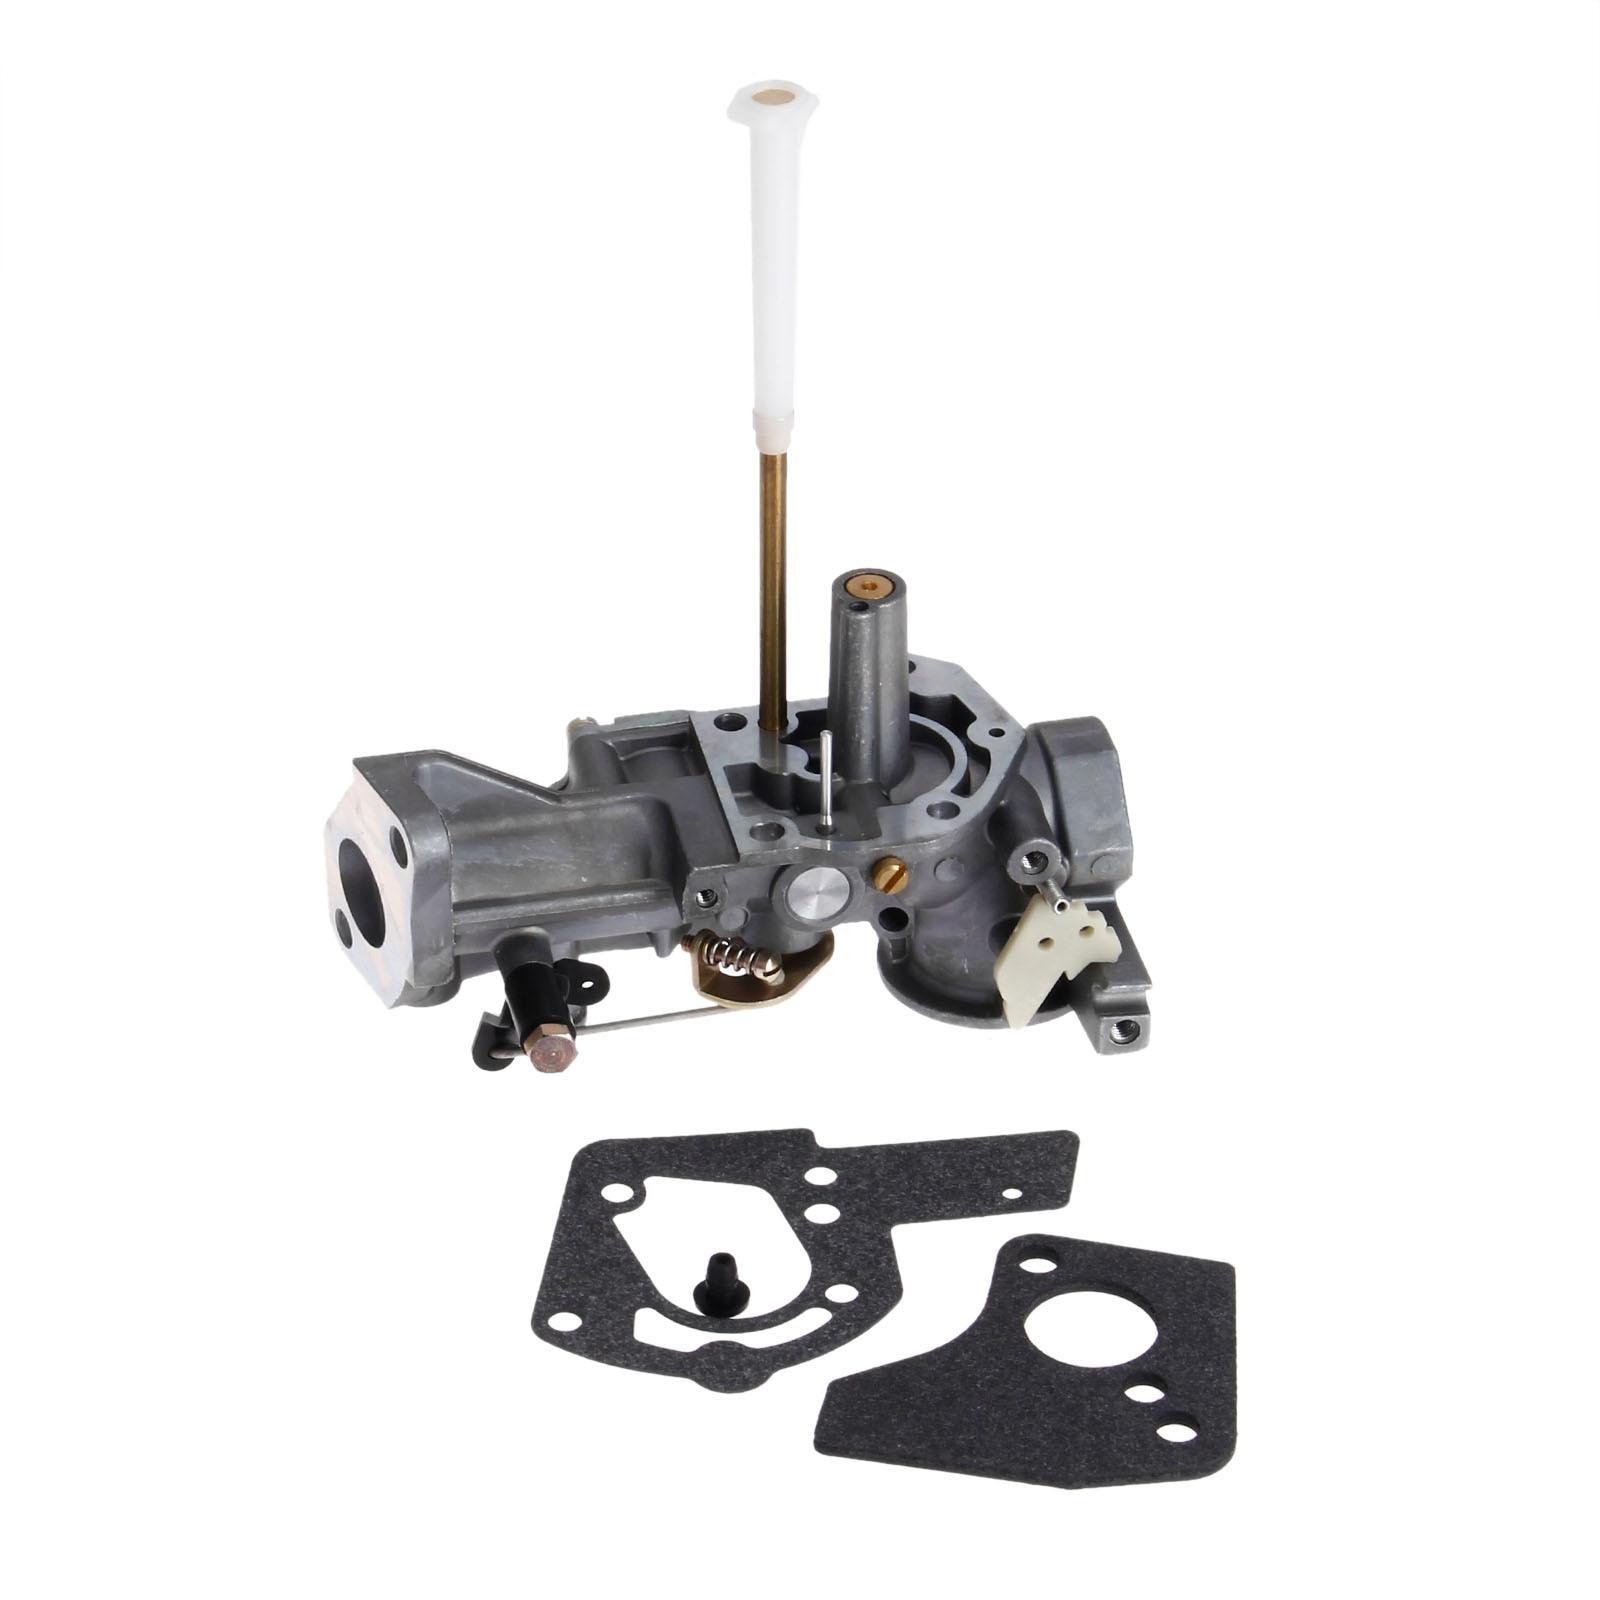 DRELD Carburetor Carbs Kit For Briggs Stratton 5HP Engines 498298 495426 692784 495951 Carbs